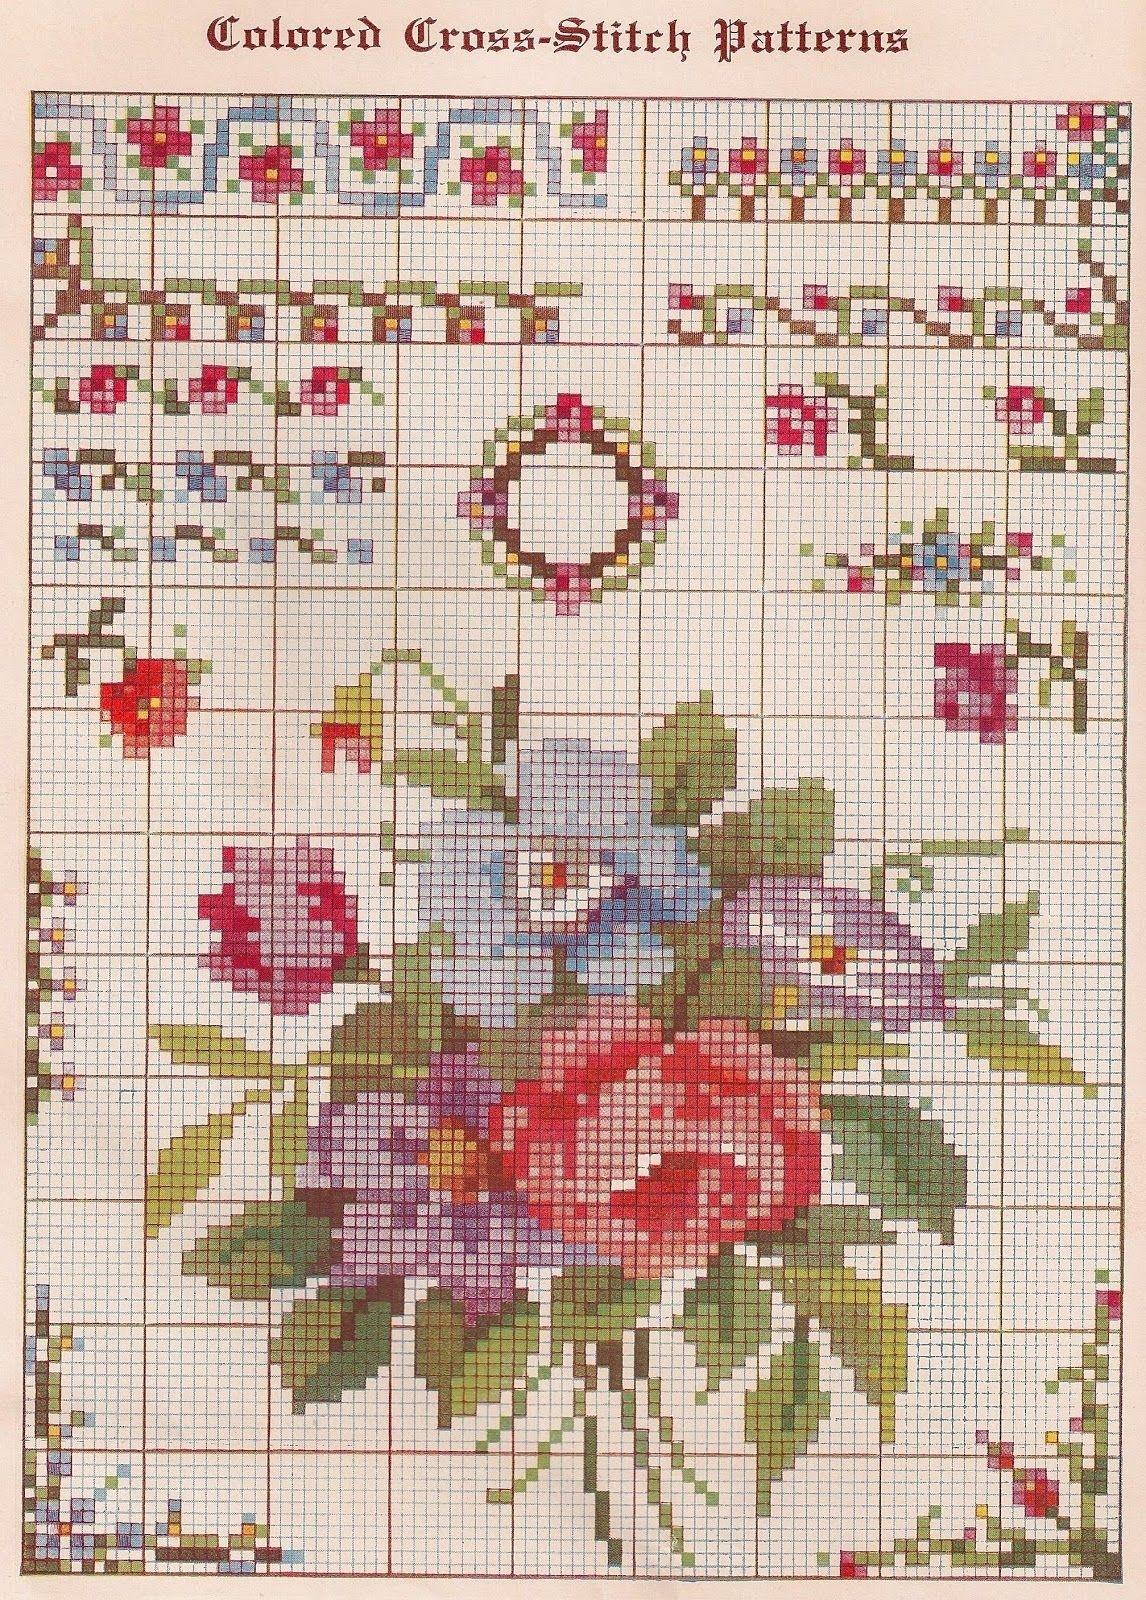 Cross Stitch Patterns Free Printable | Sentimental Baby: Free - Free Printable Cross Stitch